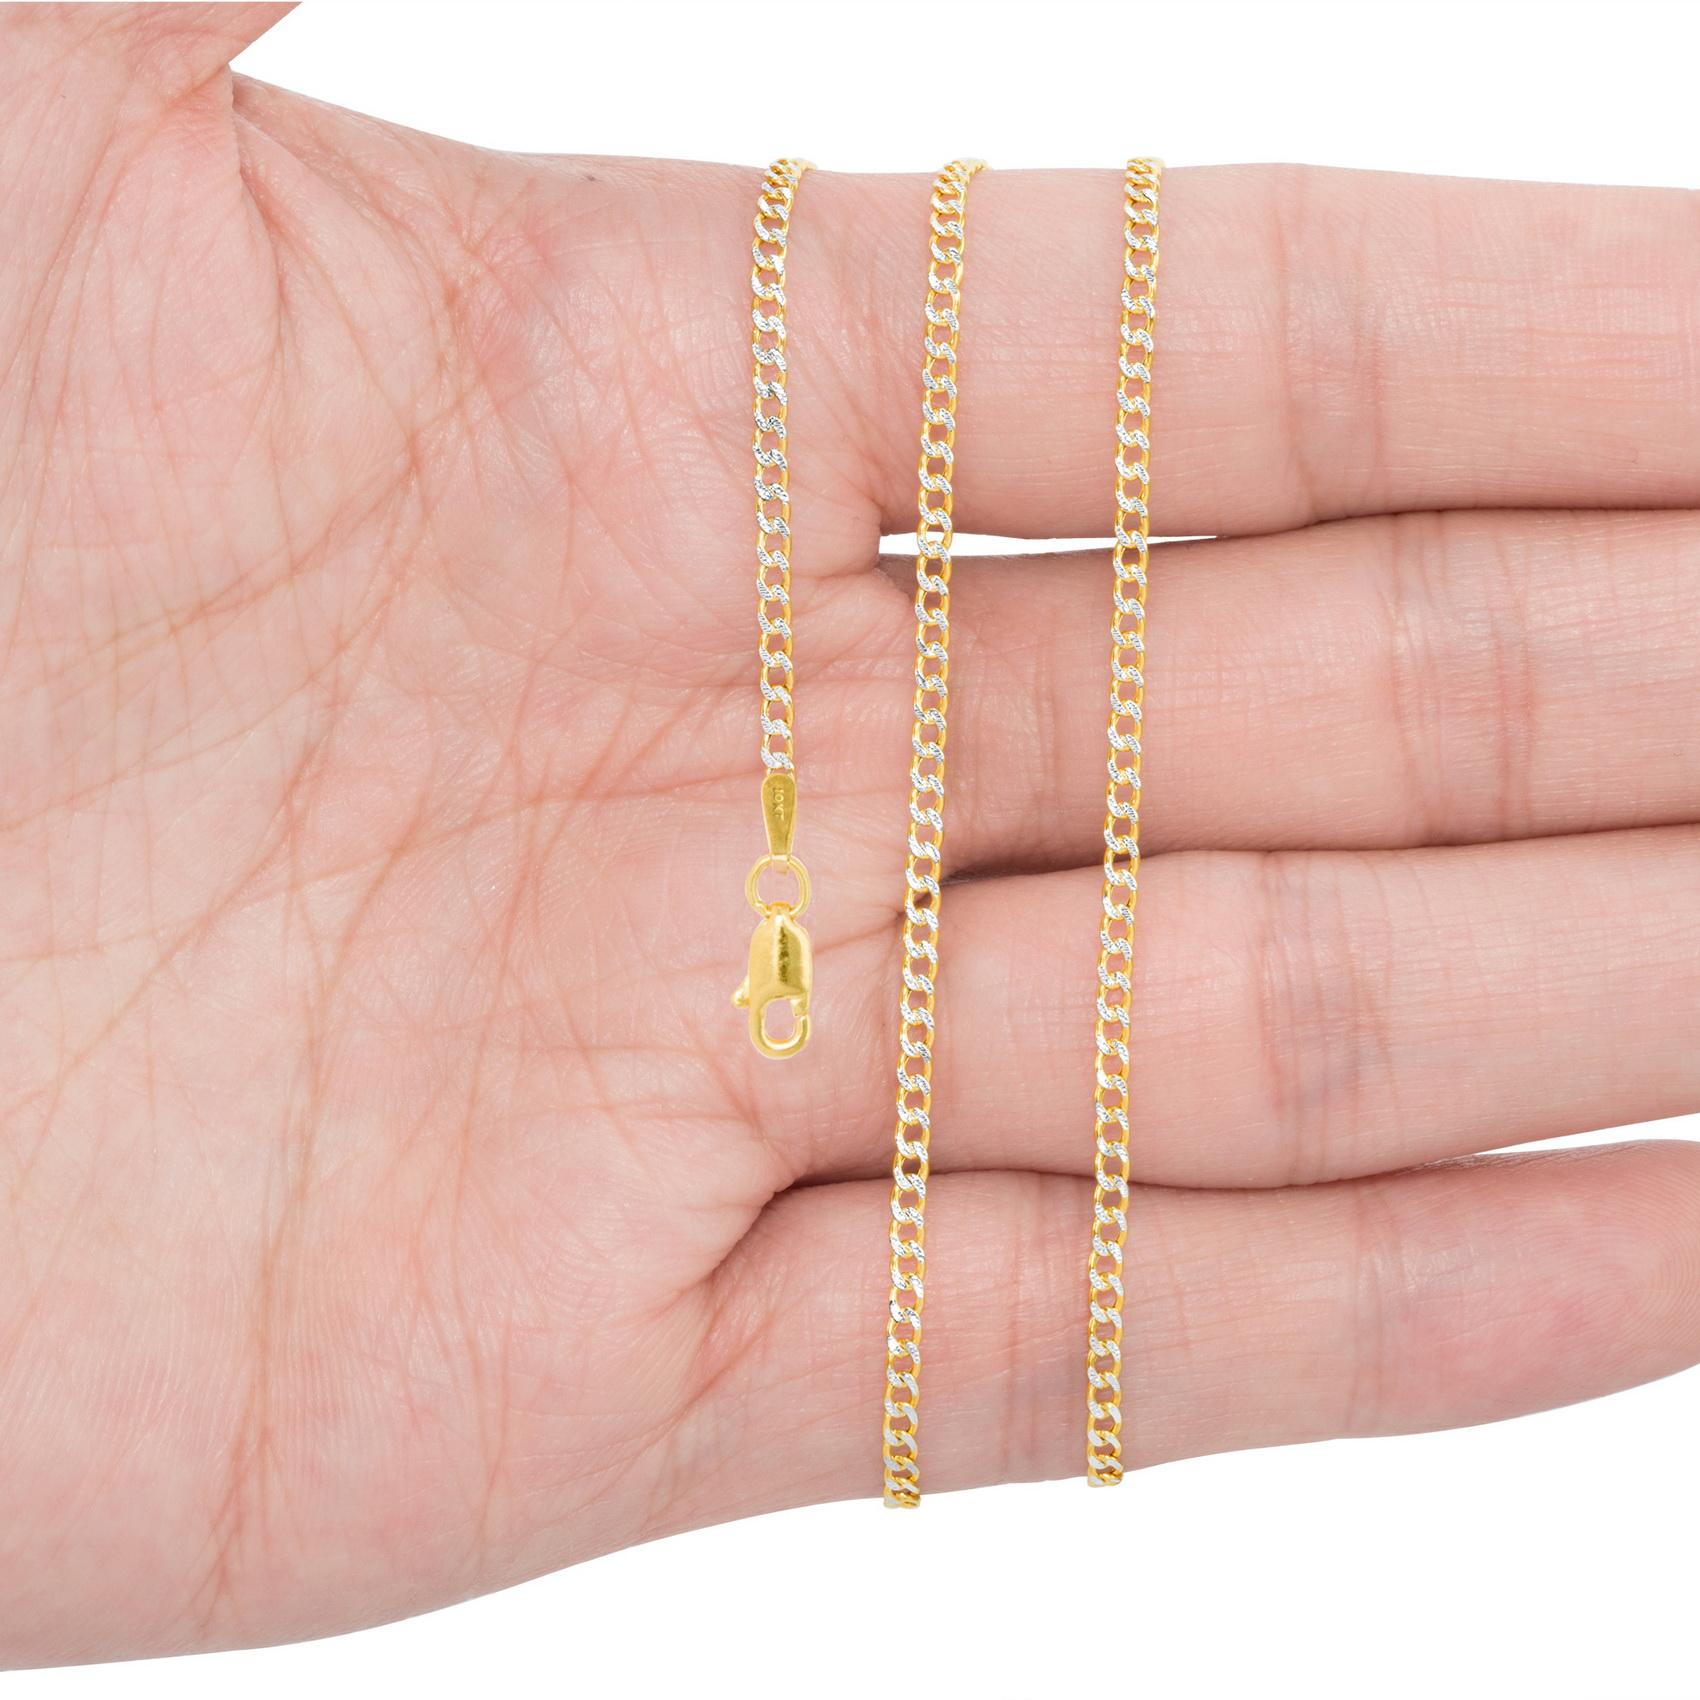 10K-Yellow-Gold-2mm-10-5mm-Diamond-Cut-Pave-Cuban-Chain-Necklace-Bracelet-7-034-30-034 thumbnail 15